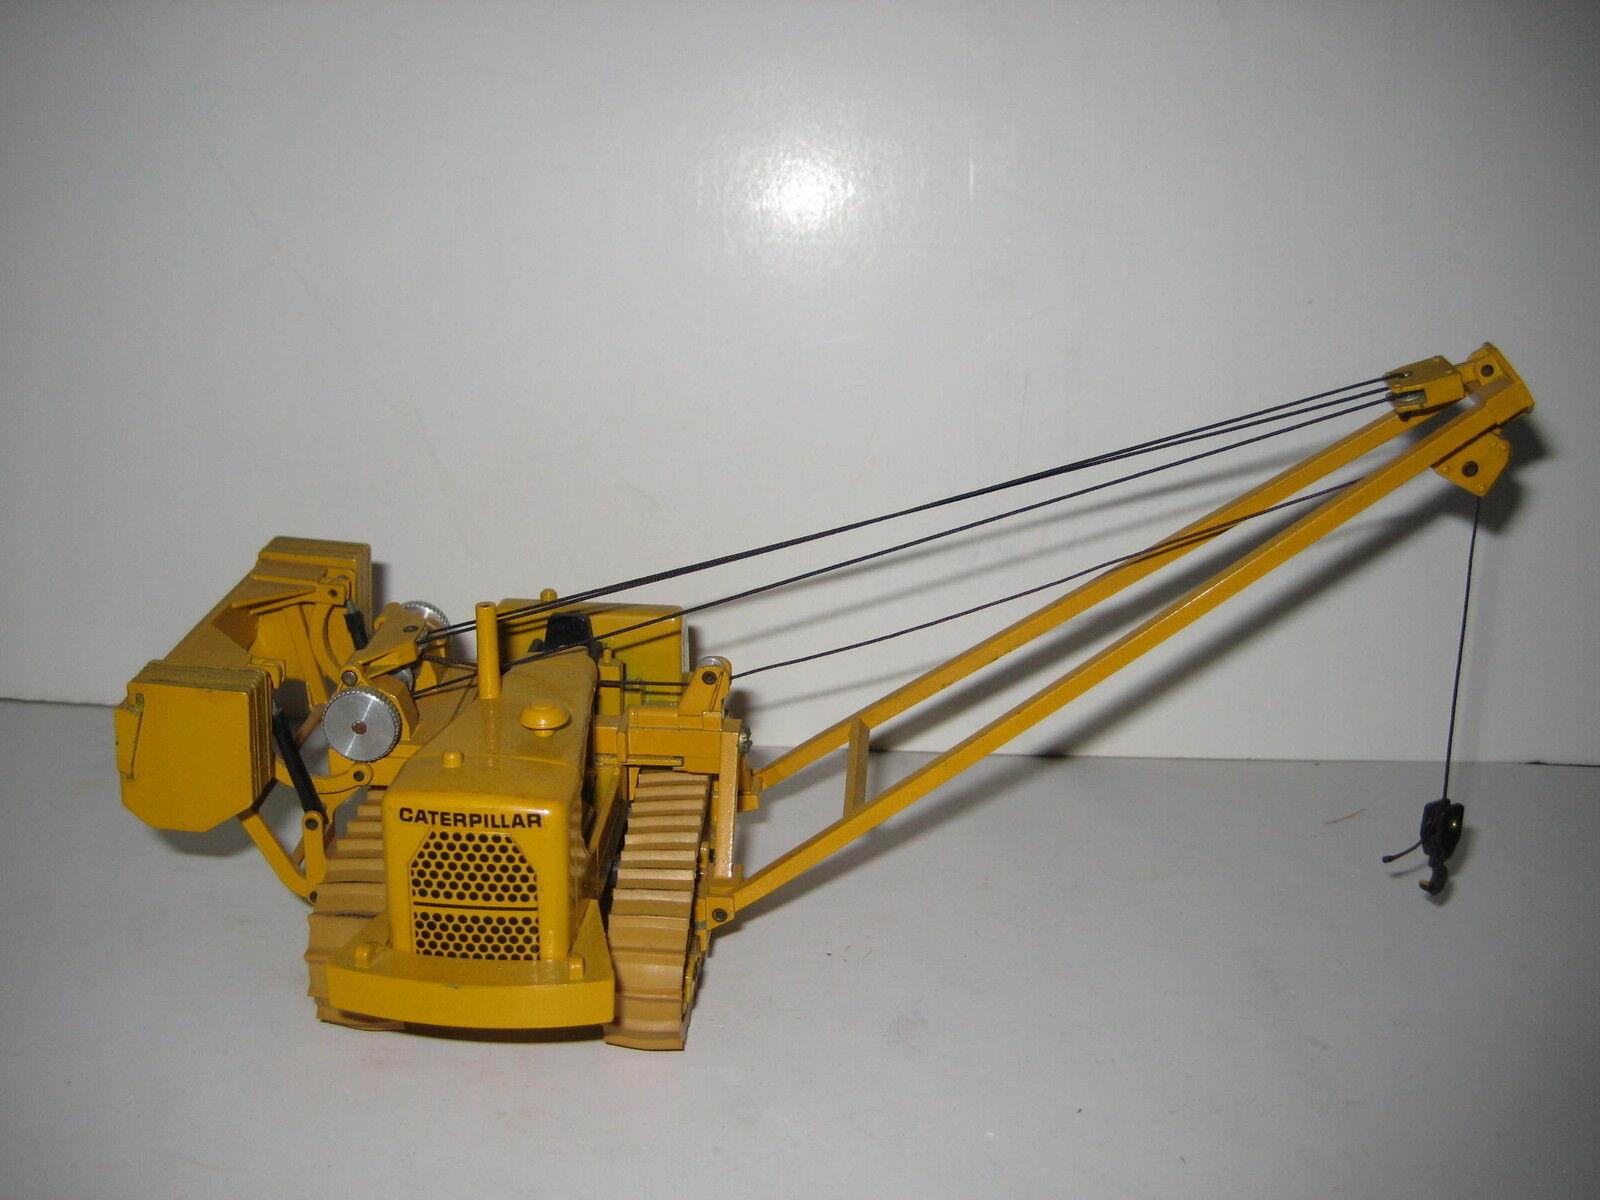 Caterpillar 594 pescante  2872.1 Gescha 1 50